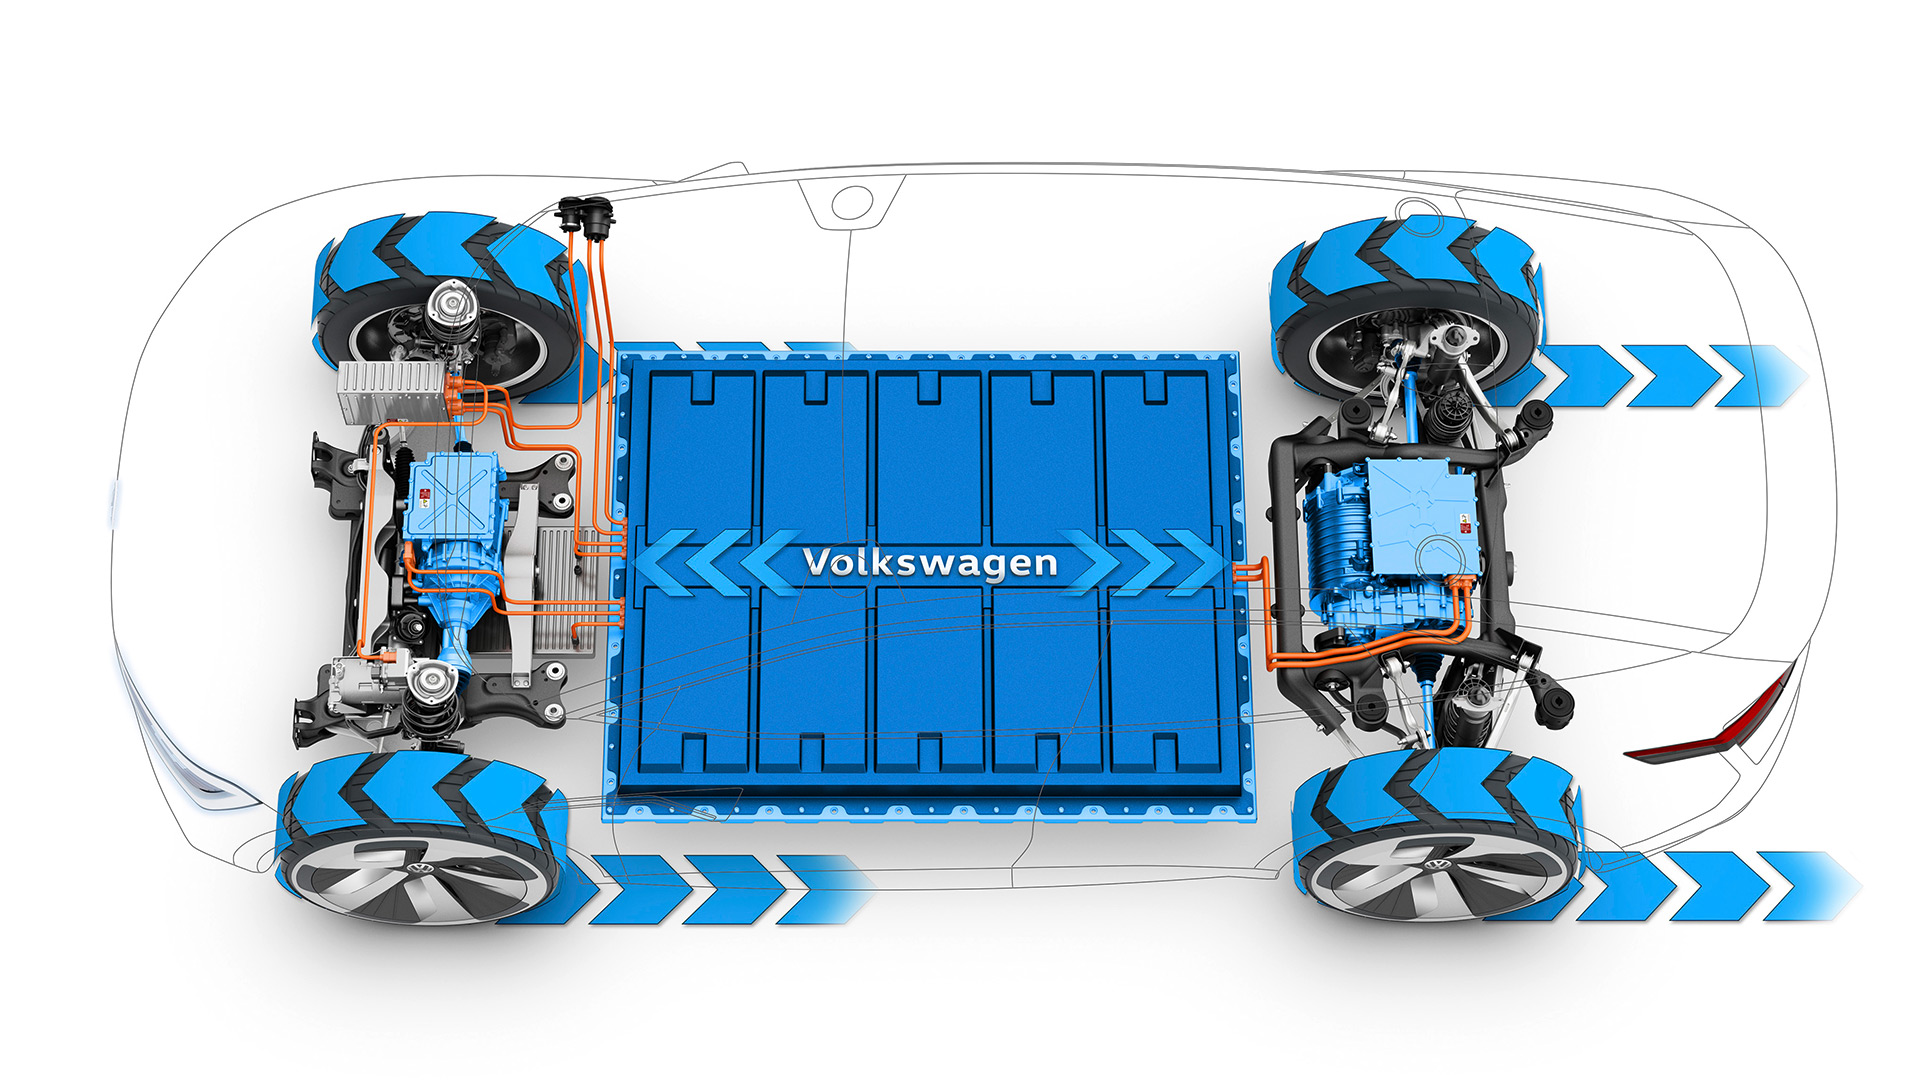 Volkswagen's Modular Electric Drive Matrix (MEB) for I.D. CROZZ Concept